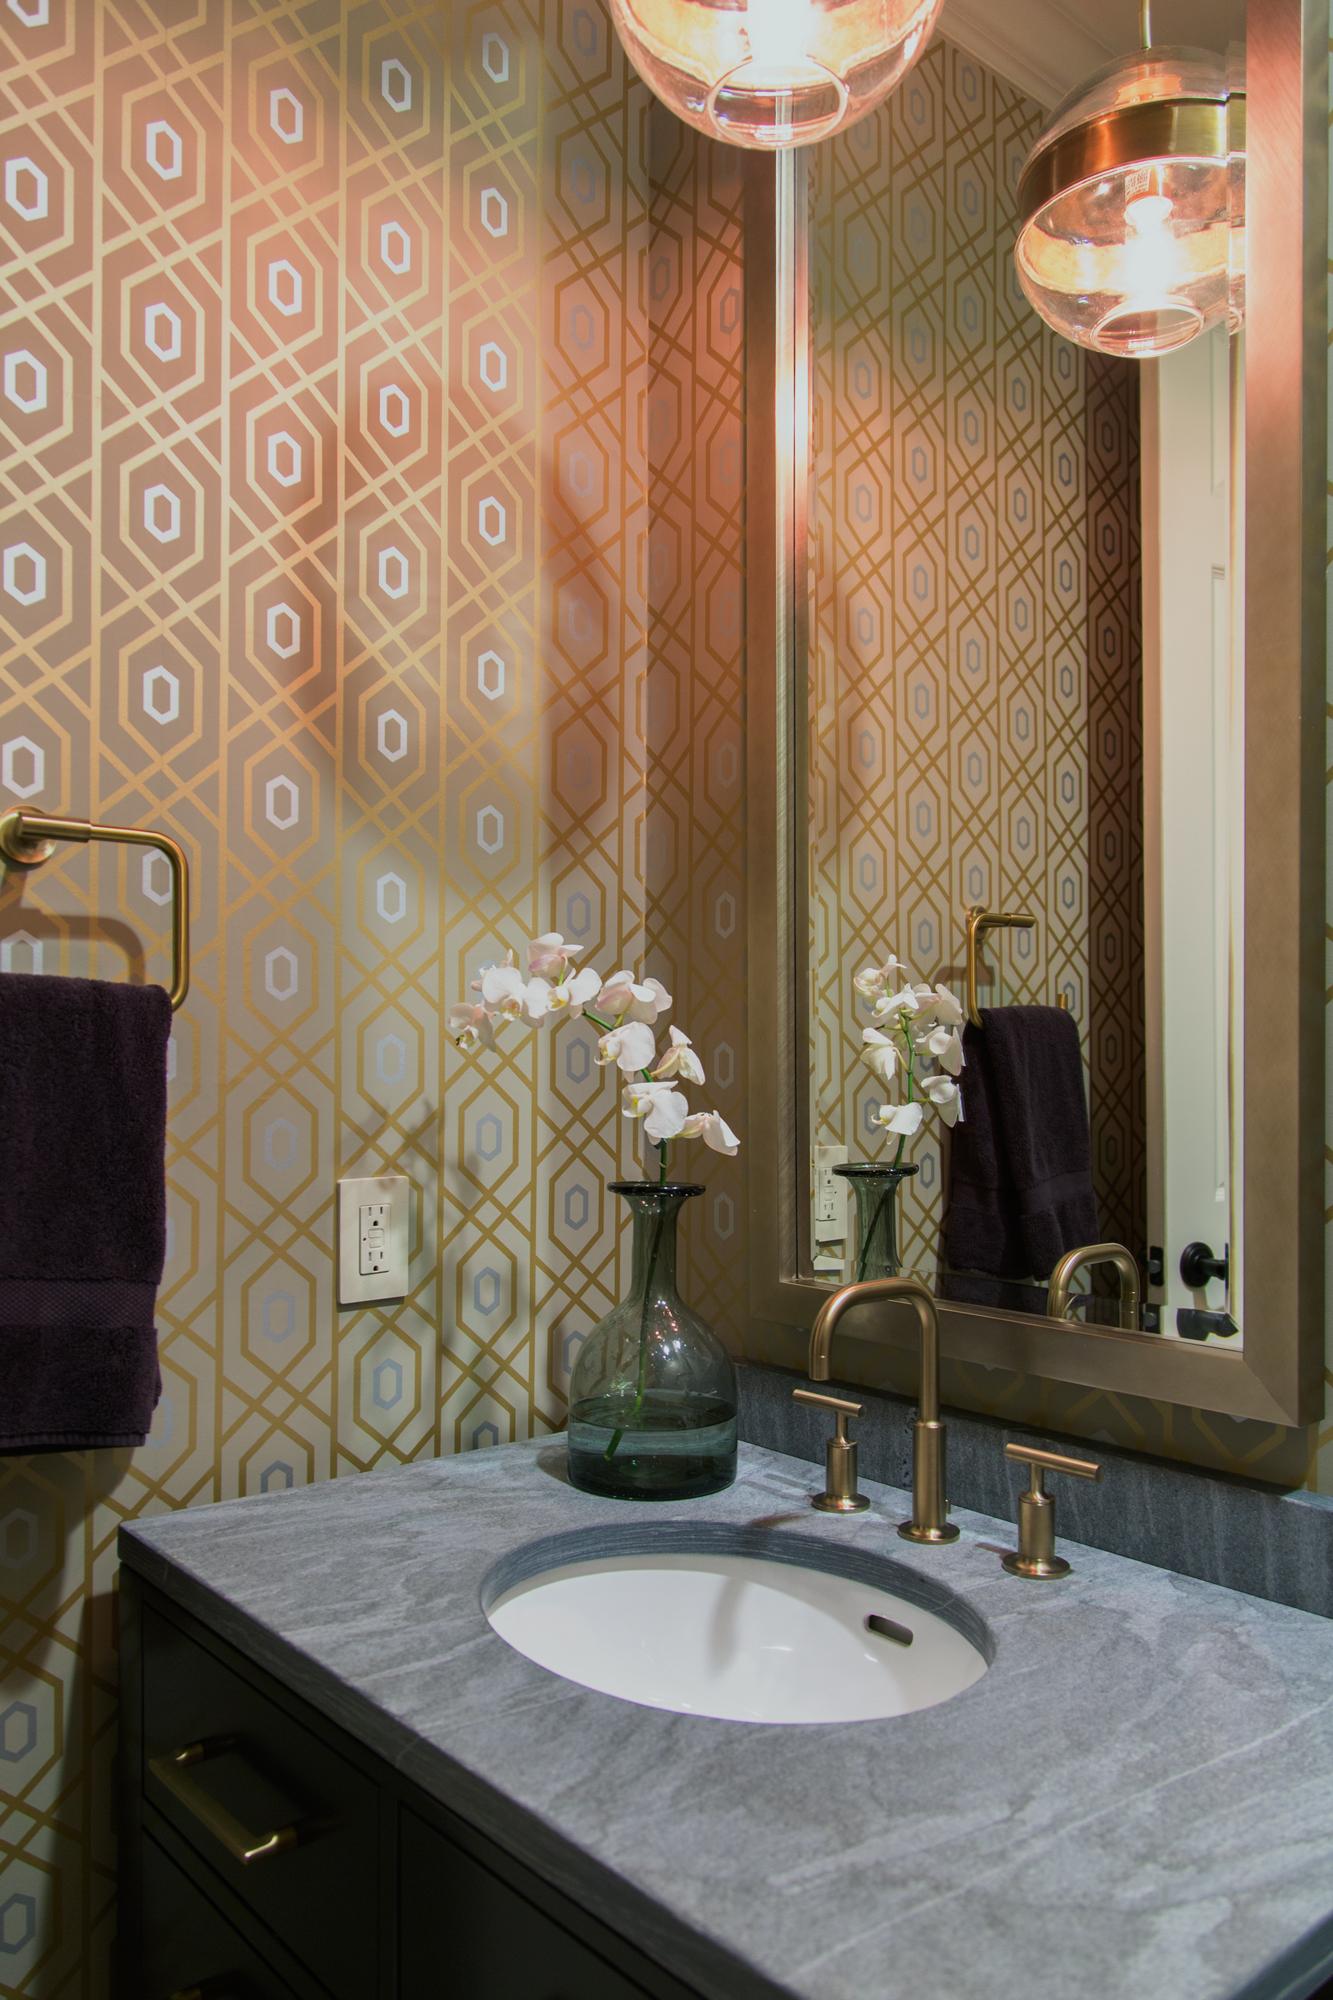 Warm and personal transitional interior, Designer: Carla Aston